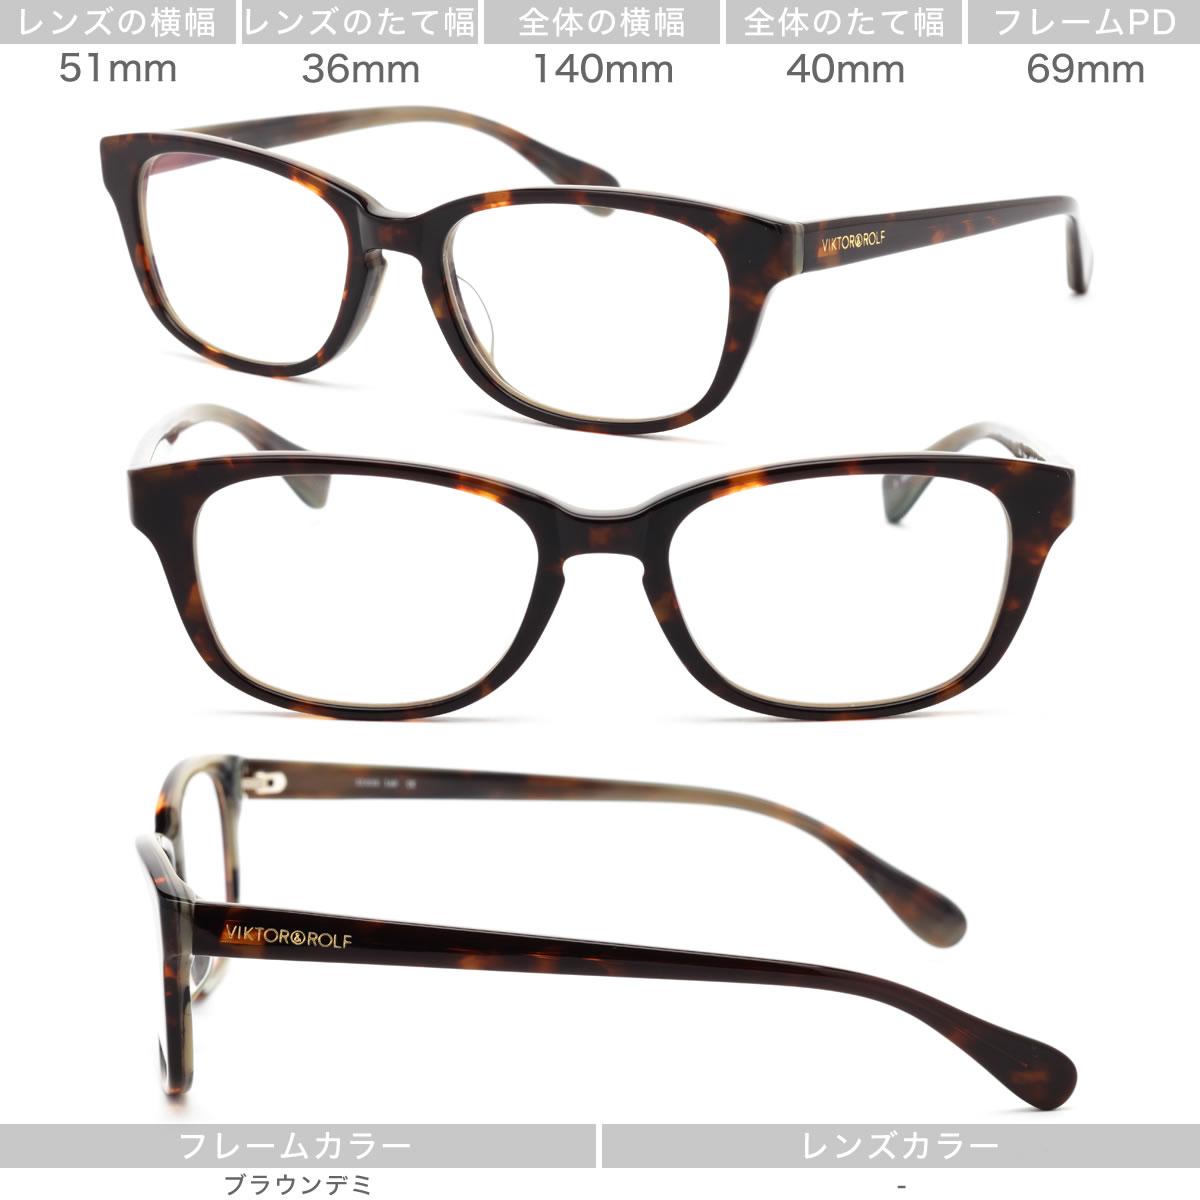 Optical Shop Thats | Rakuten Global Market: 70-0107 03 glasses set ...